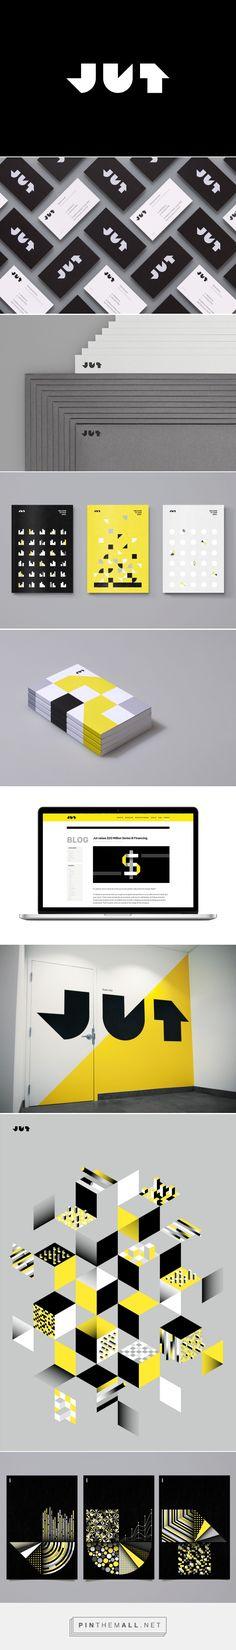 Jut Branding by Moniker | Fivestar Branding – Design and Branding Agency & Inspiration Gallery